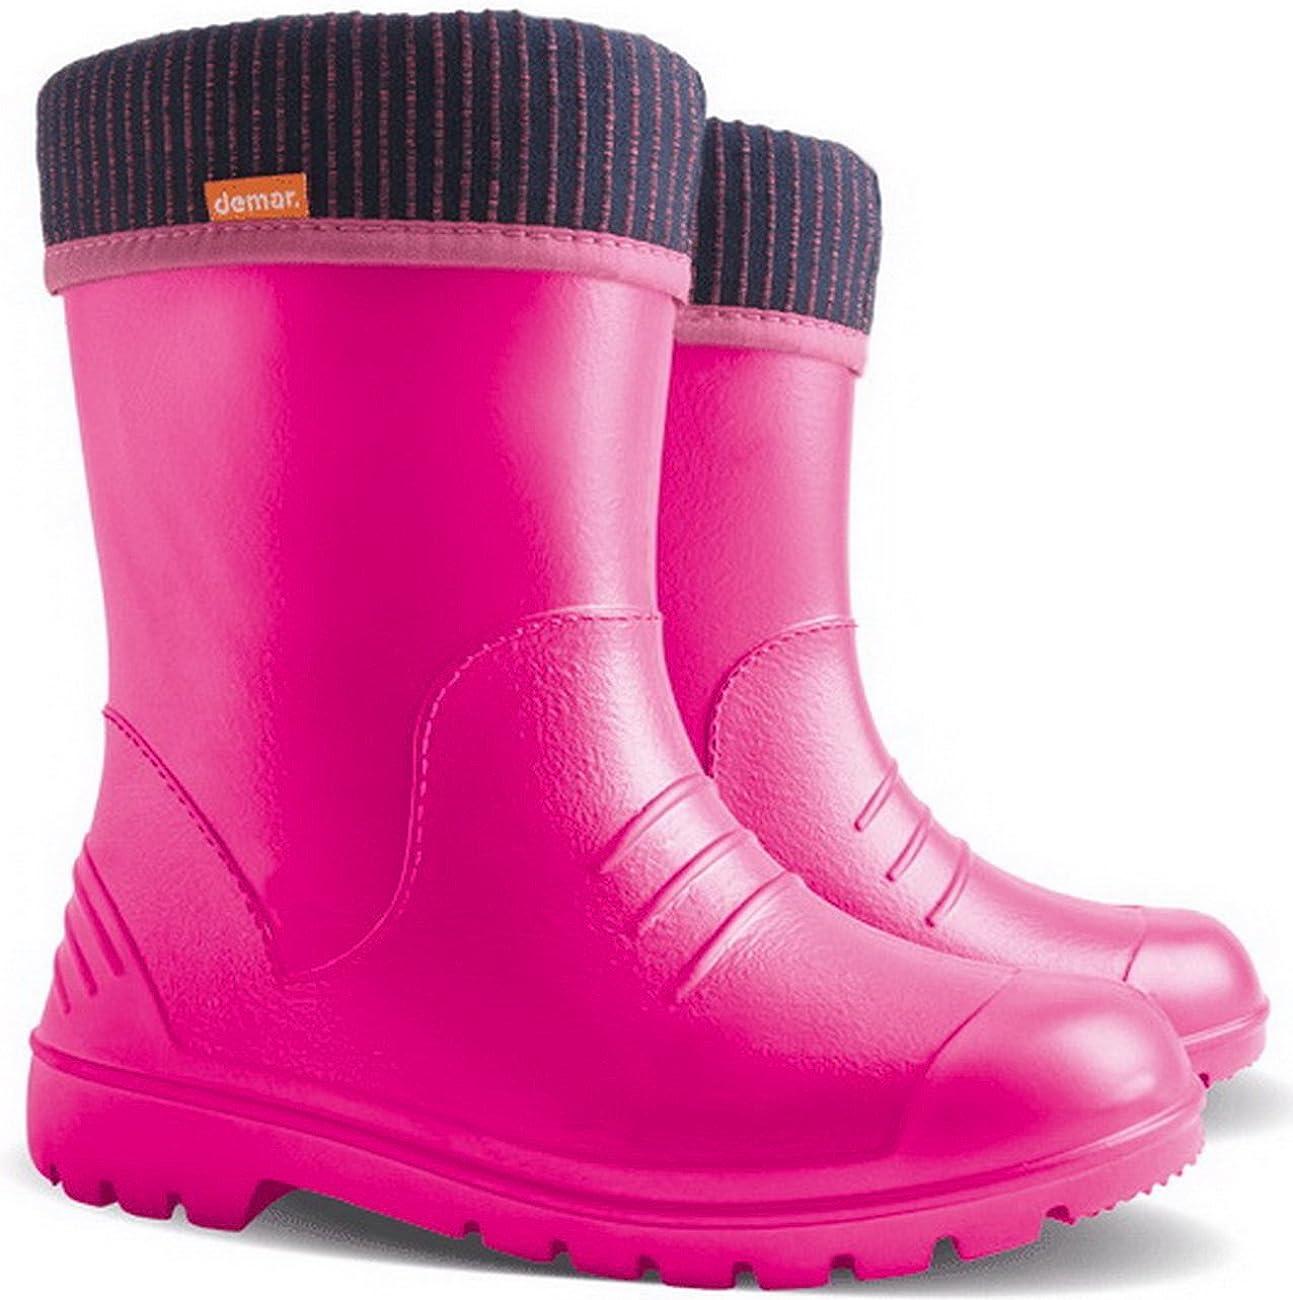 Ultralight Boys Girls Kids Warm Lined Rain Boots Wellington Boots Wellies Dino